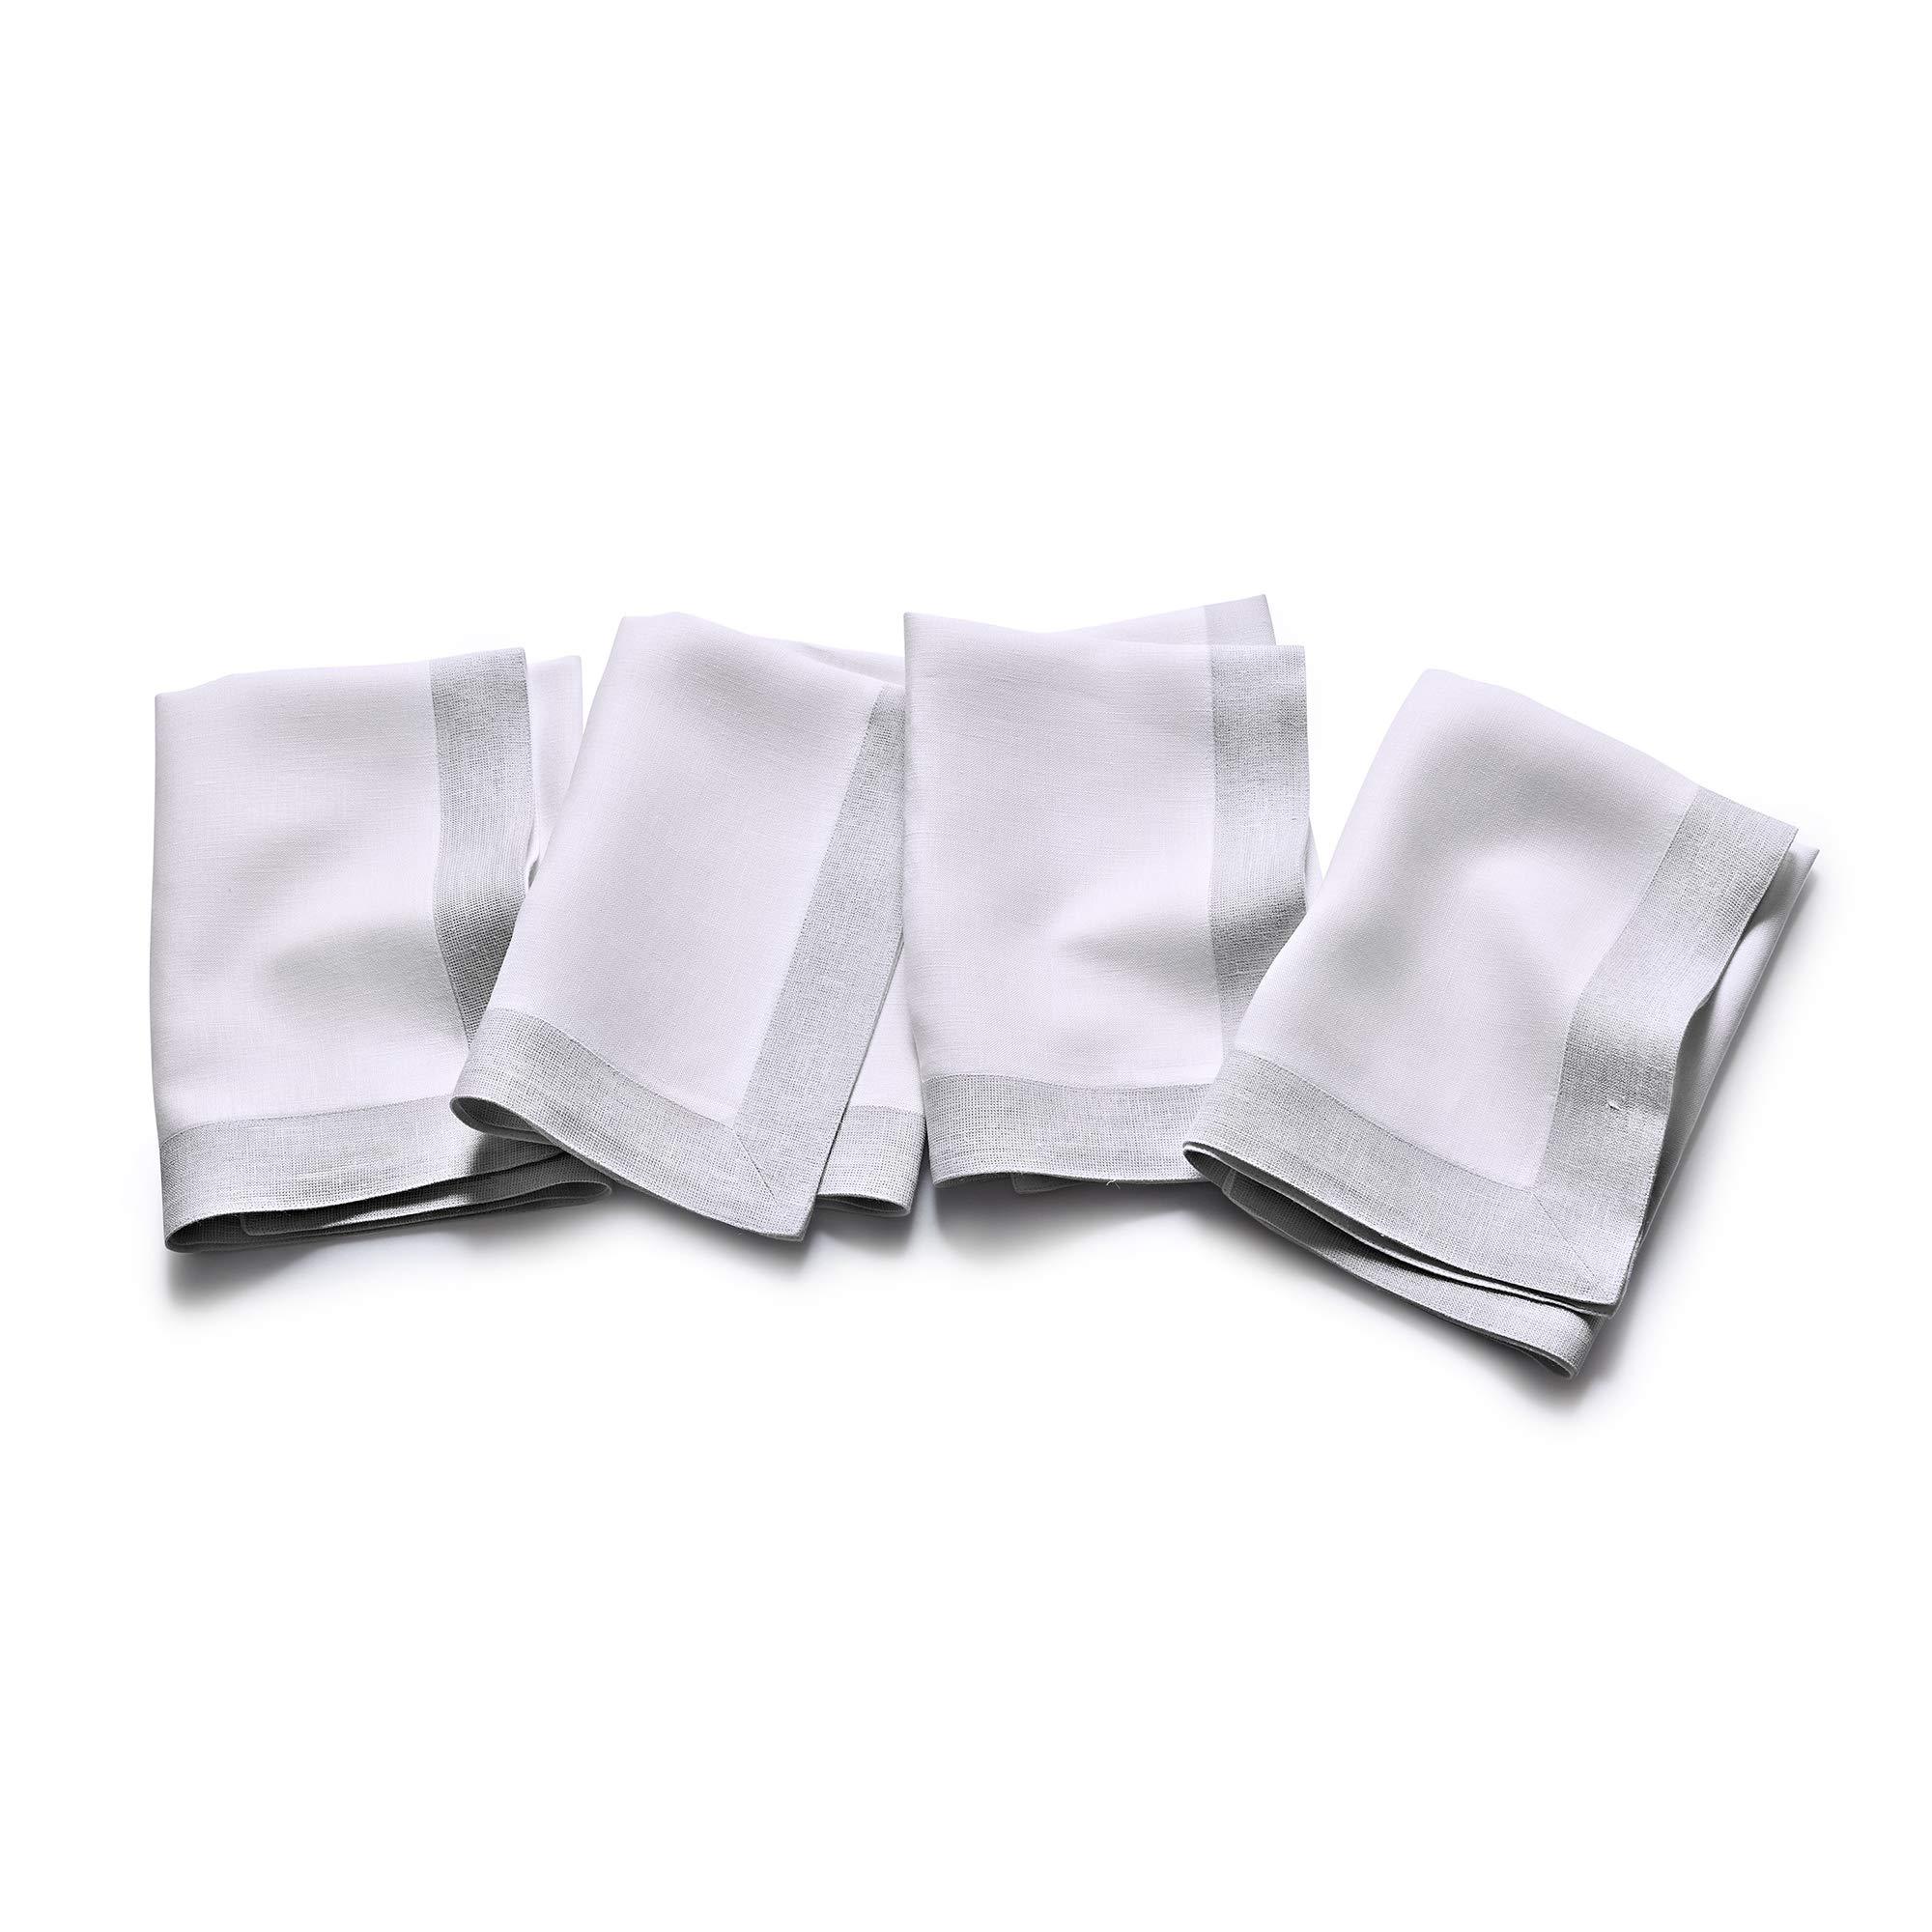 Solino Home Decorative Linen Dinner Napkin - Festive Edge, 20 x 20 Inch Set of 4 Napkin Woven with Decorative Zari Border - White with White by Solino Home